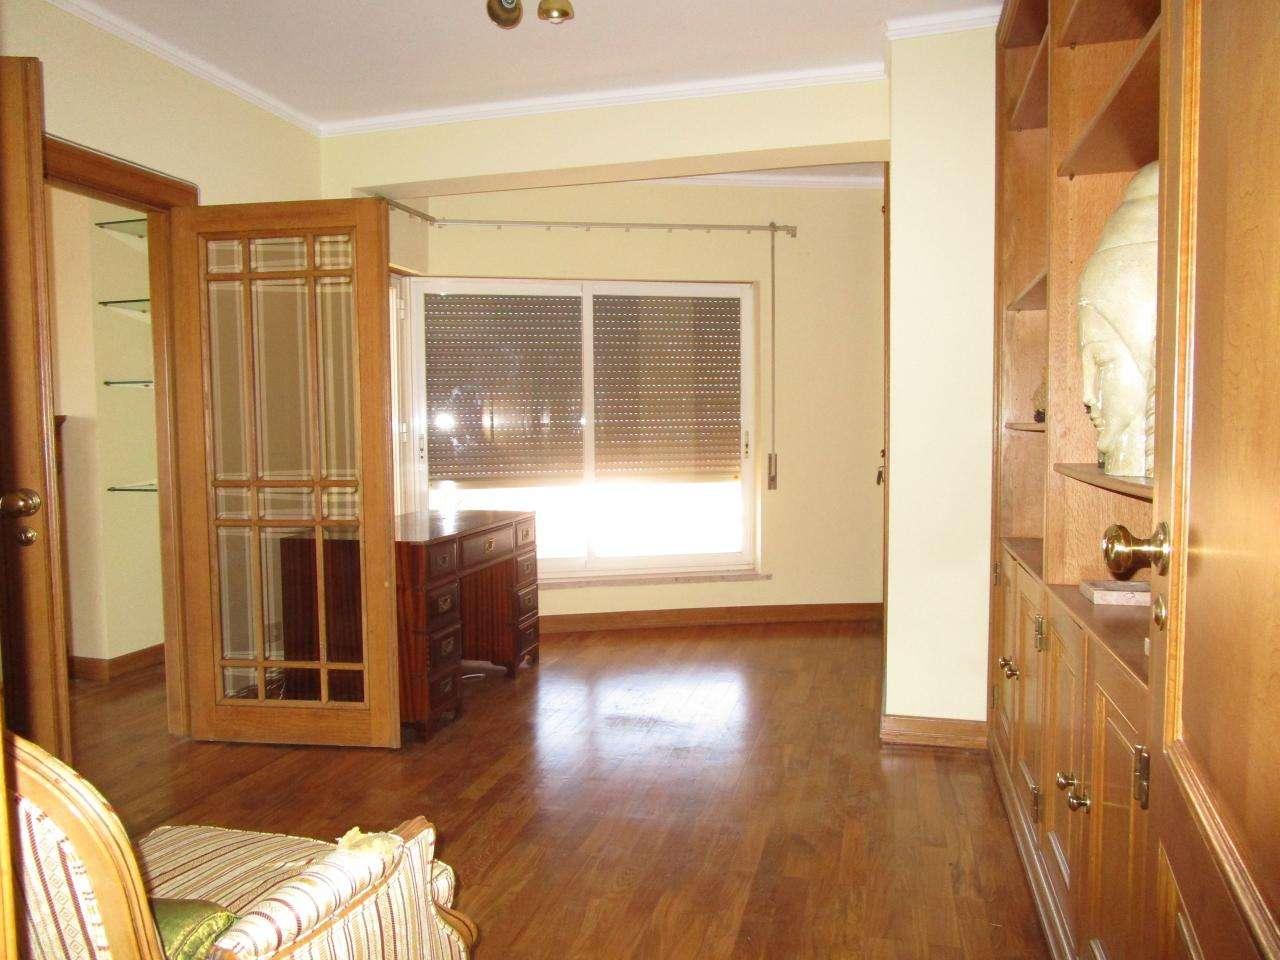 Apartamento para comprar, Cascais e Estoril, Cascais, Lisboa - Foto 21